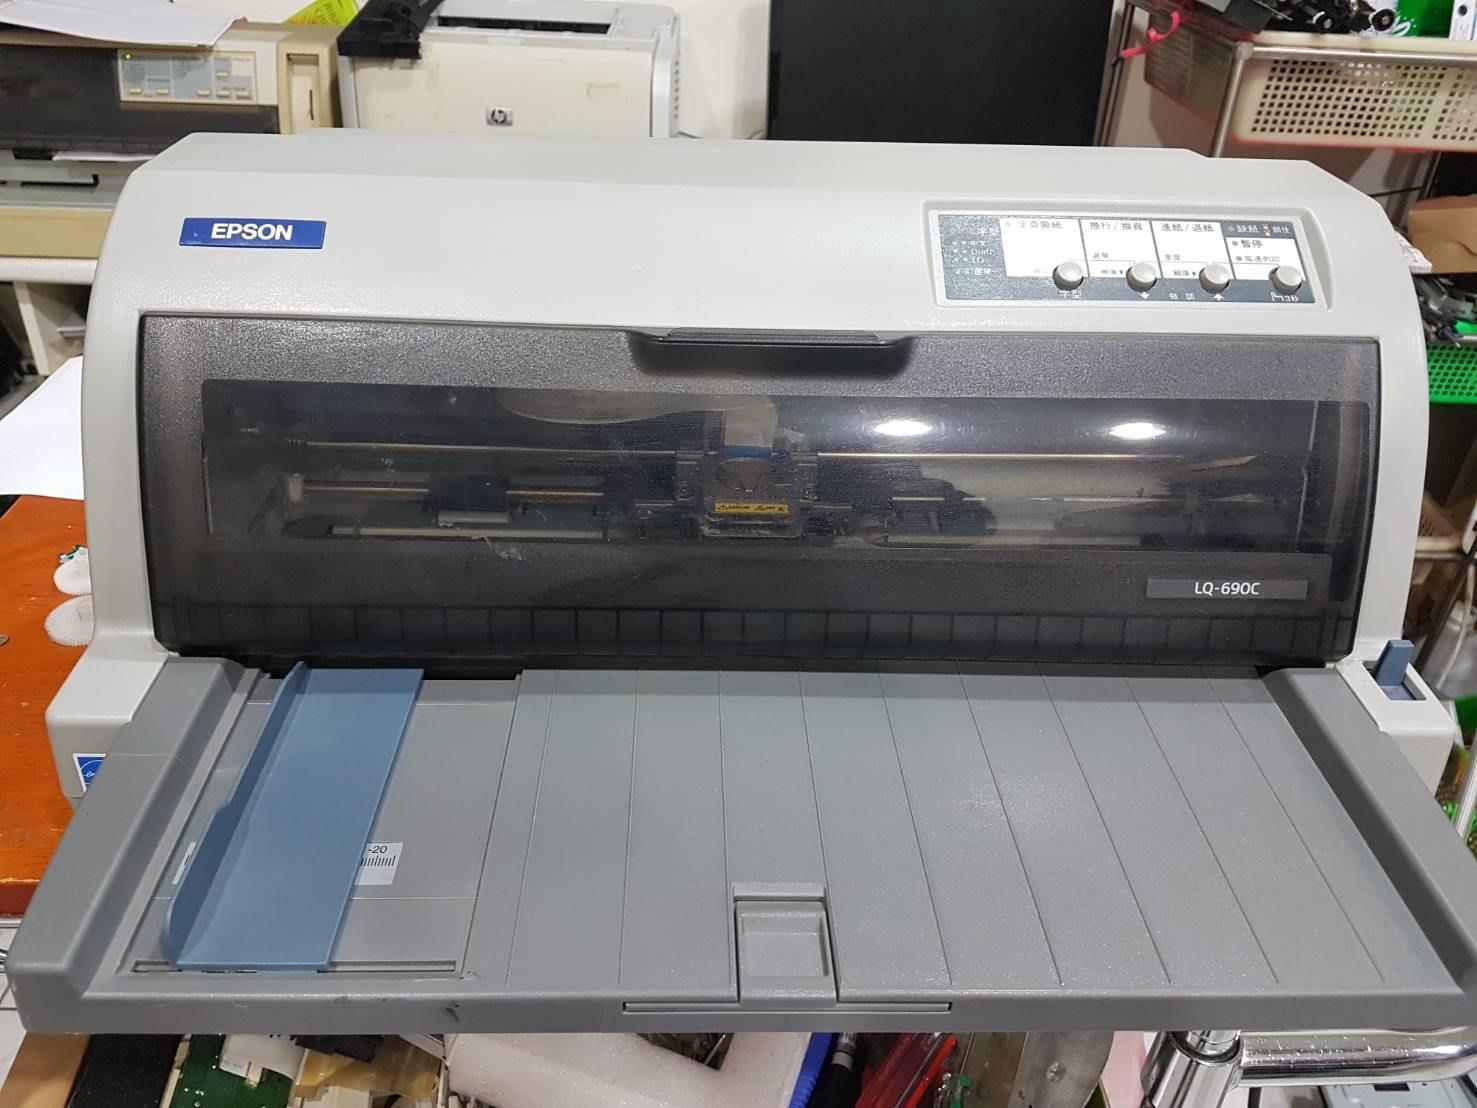 EPSON LQ-690C 整新 高速商用點陣式印表機 適合各行各業 出貨單 | Yahoo奇摩拍賣